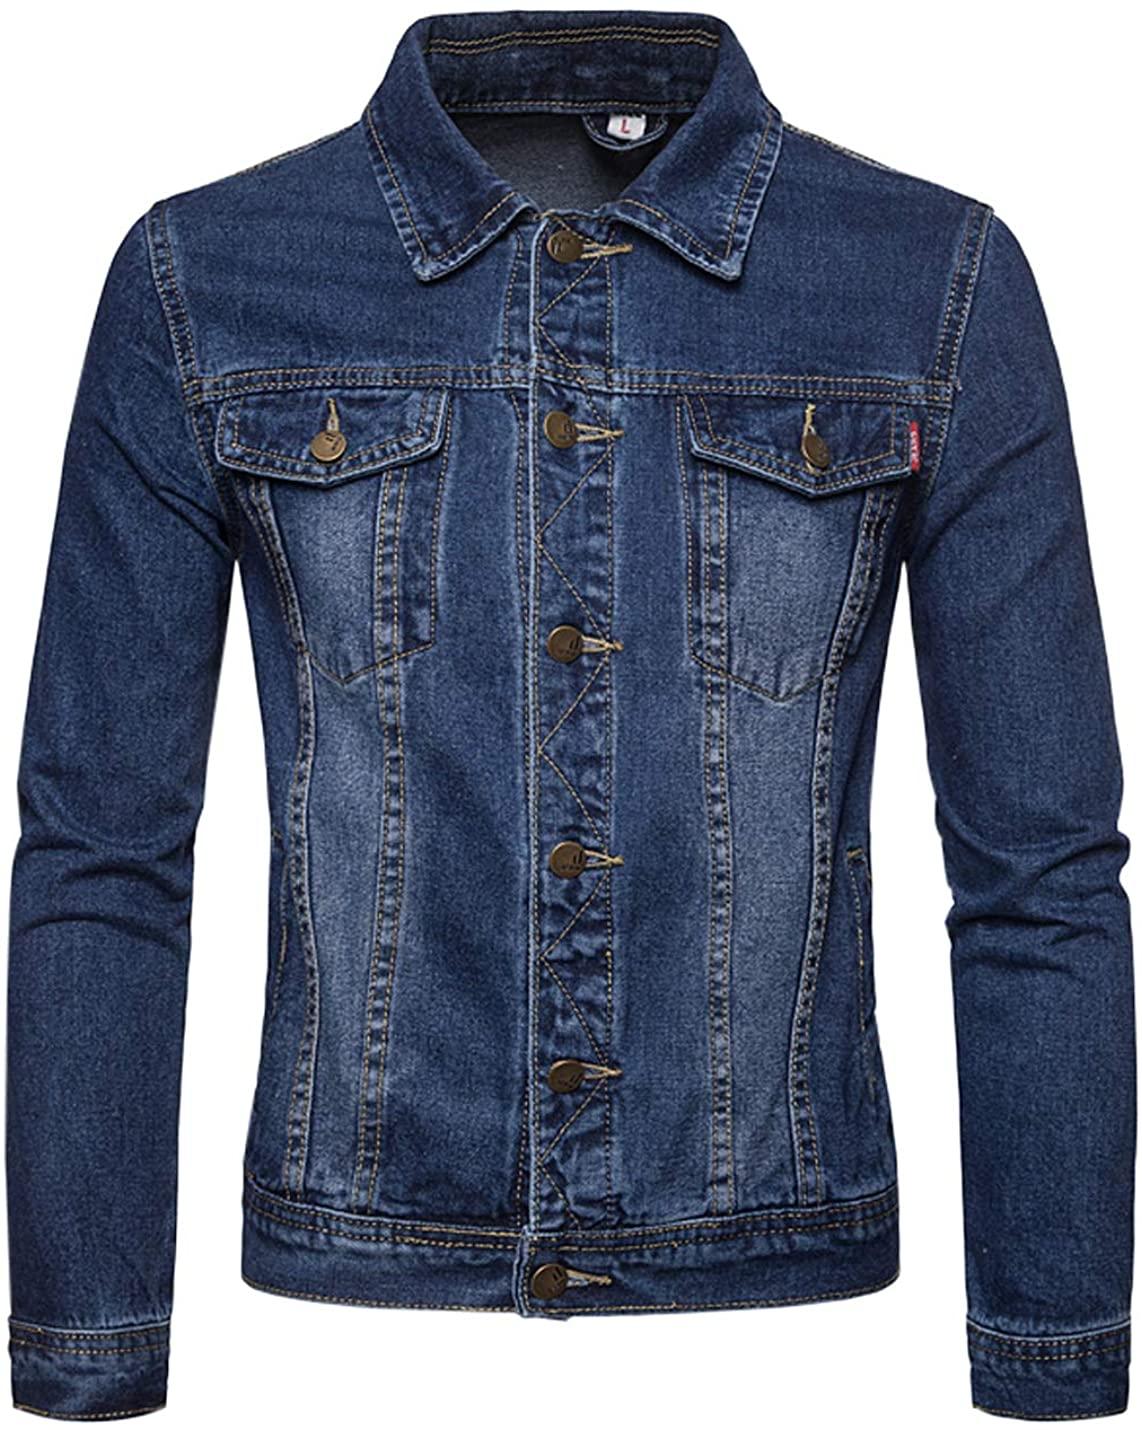 Firehood Men's Vintage Punk Relaxed Button Down Denim Jacket Classic Trucker Jean Coat